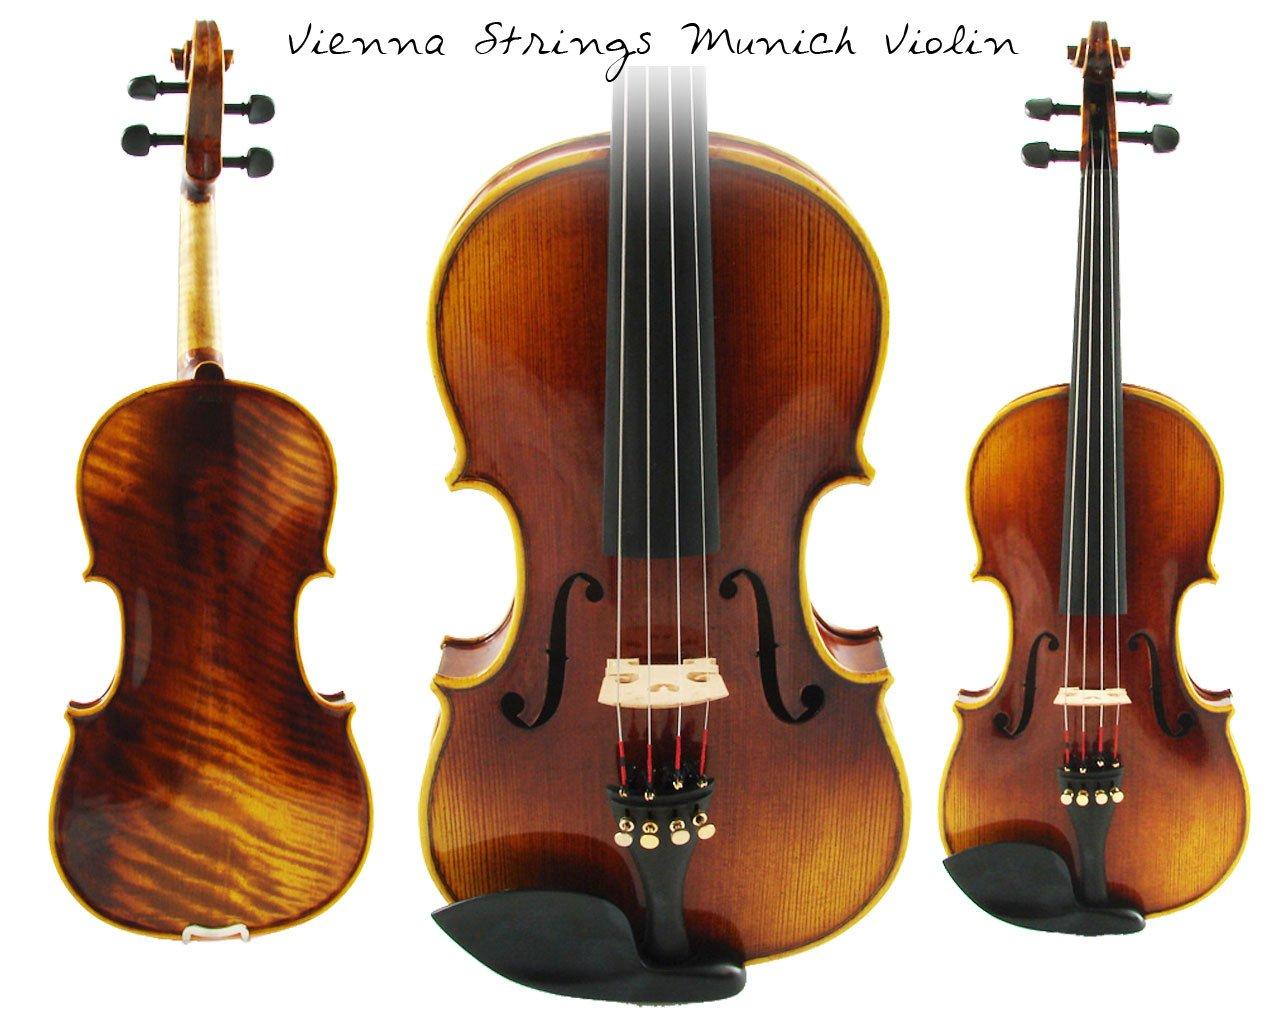 Vienna Strings Munich Violin